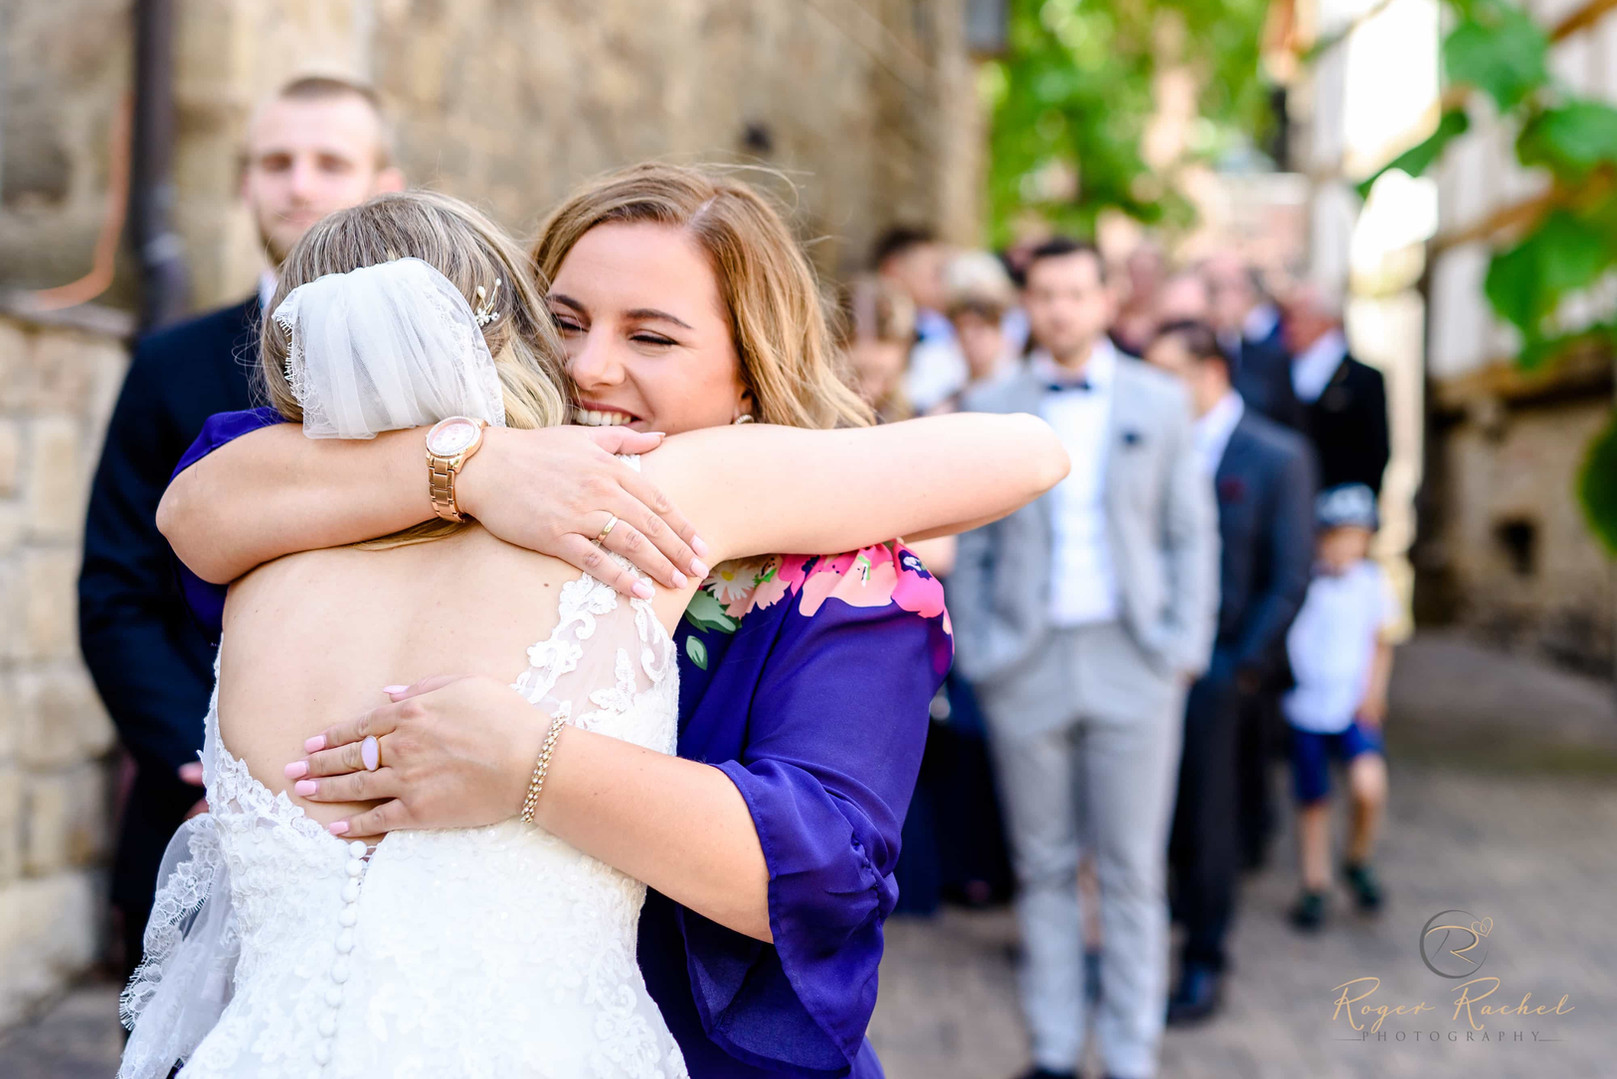 Gratulation dem Brautpaar